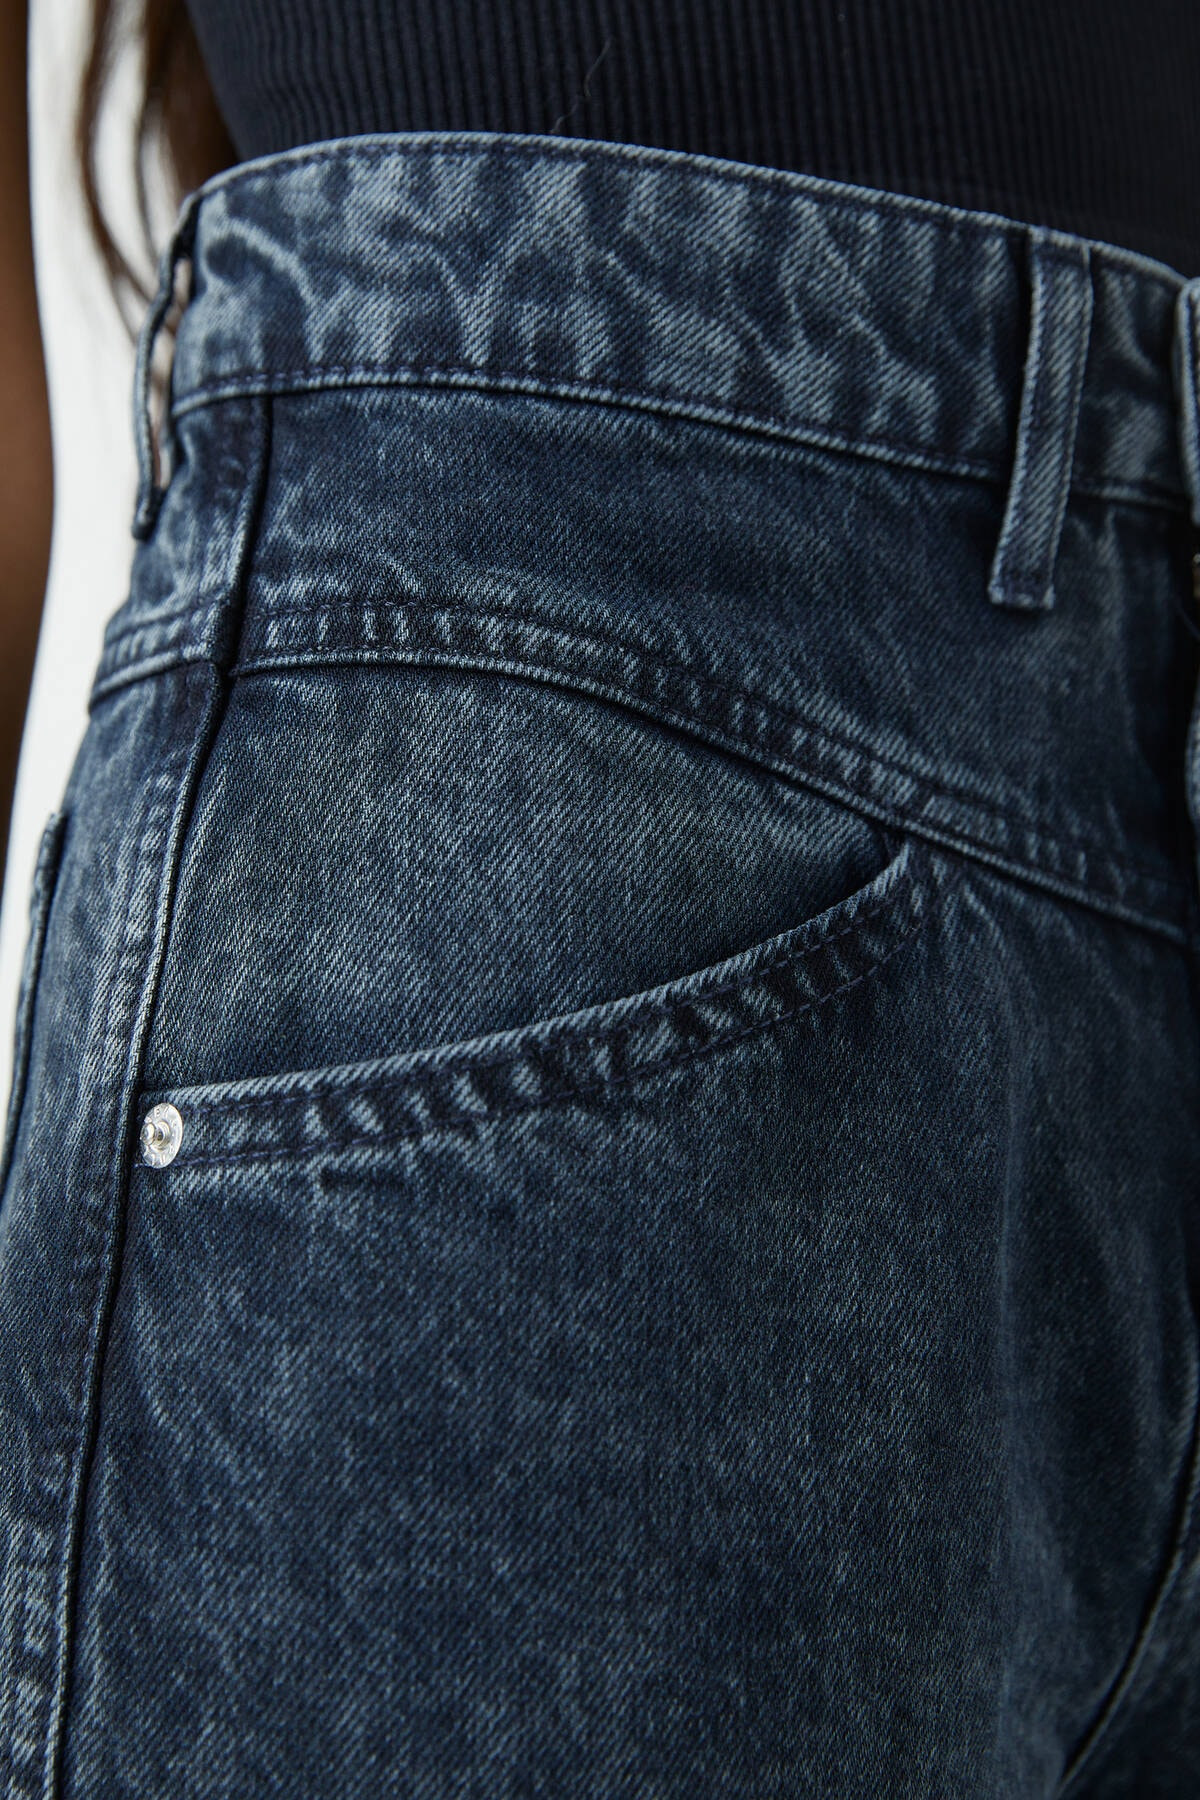 Pull & Bear Kadın Siyah Yüksek Bel Straight Fit Jean 09683335 1